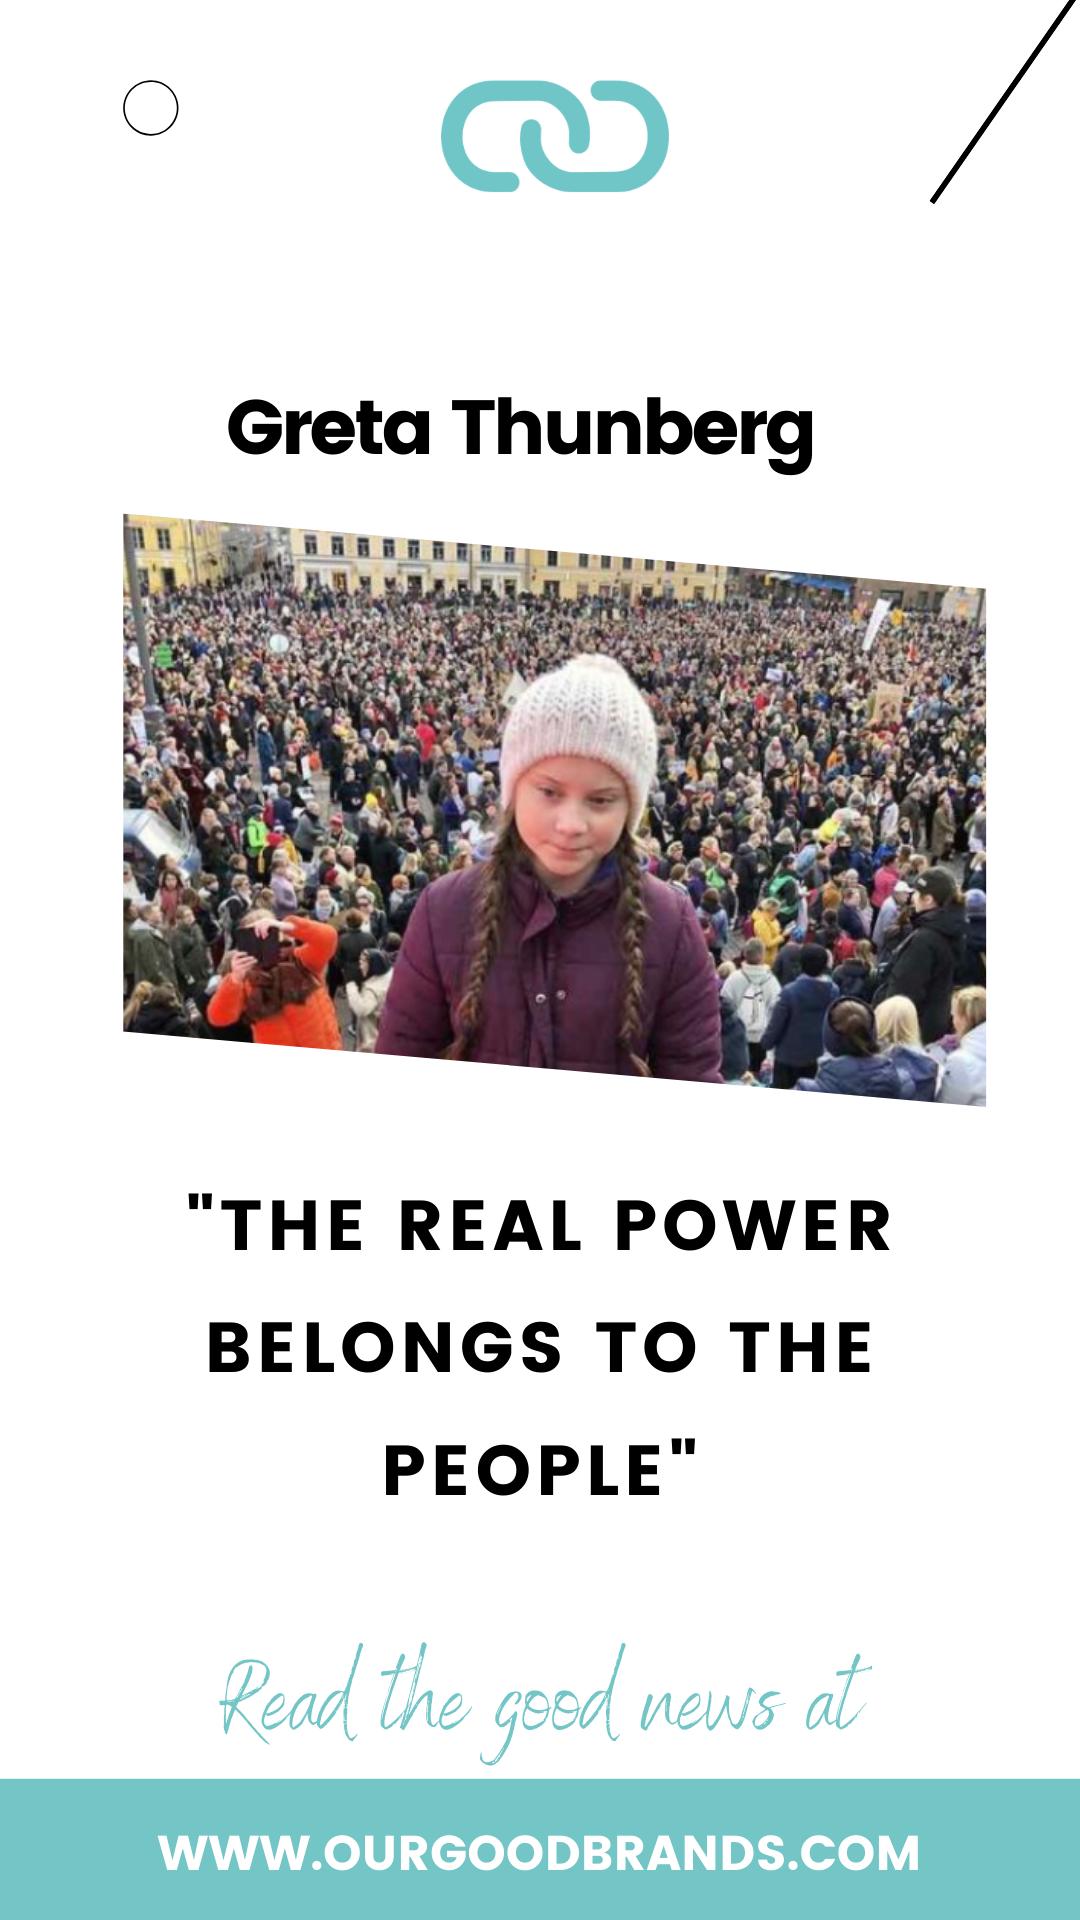 Greta Thunberg Leader Of A Worldwide Revolution For Climate Change School Strike Climate Change Great Sentences